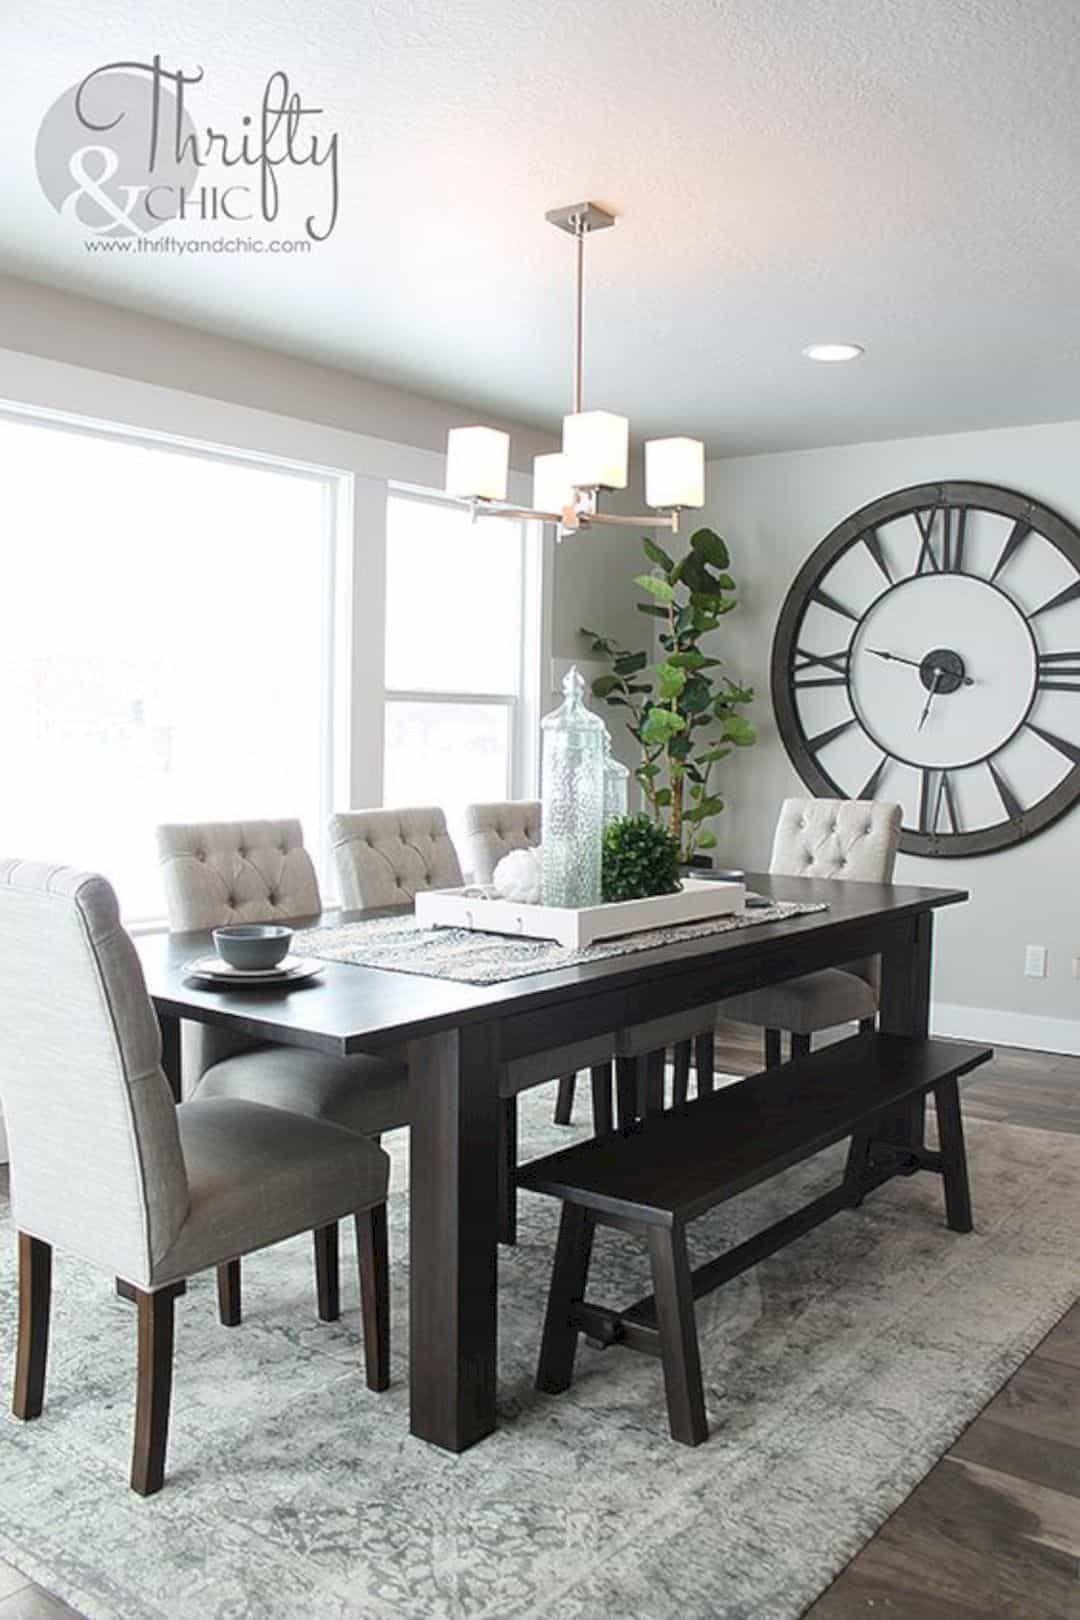 5 Best Dining Room Decorating Ideas Grey Dining Room Dining Room Small Dining Room Wall Decor